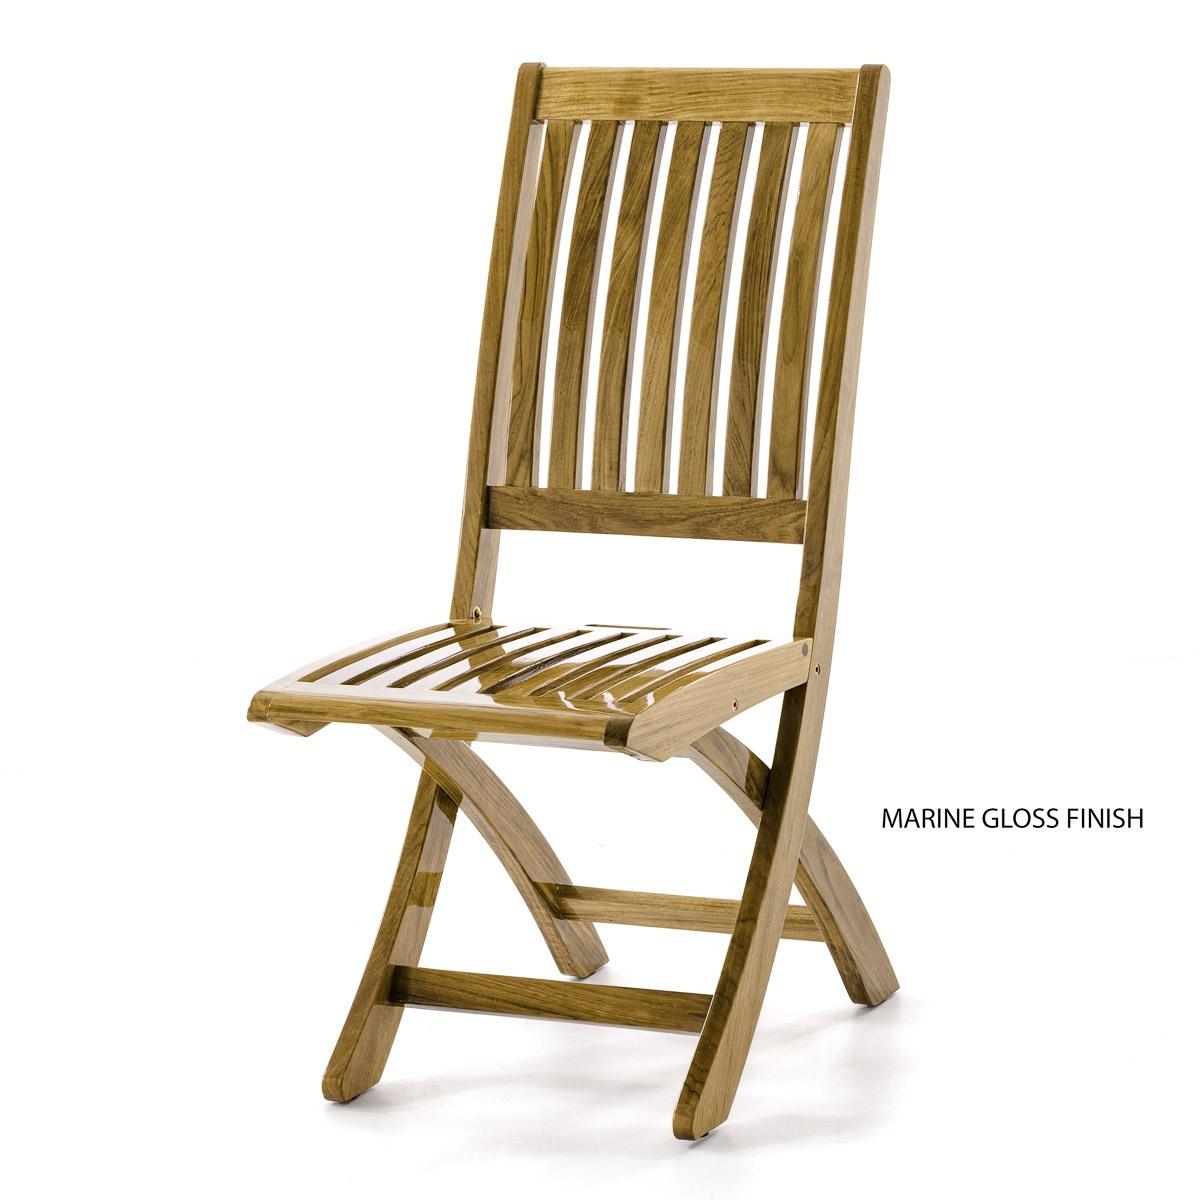 Barbuda Folding Teak Dining Chair Westminster Teak Outdoor Furniture